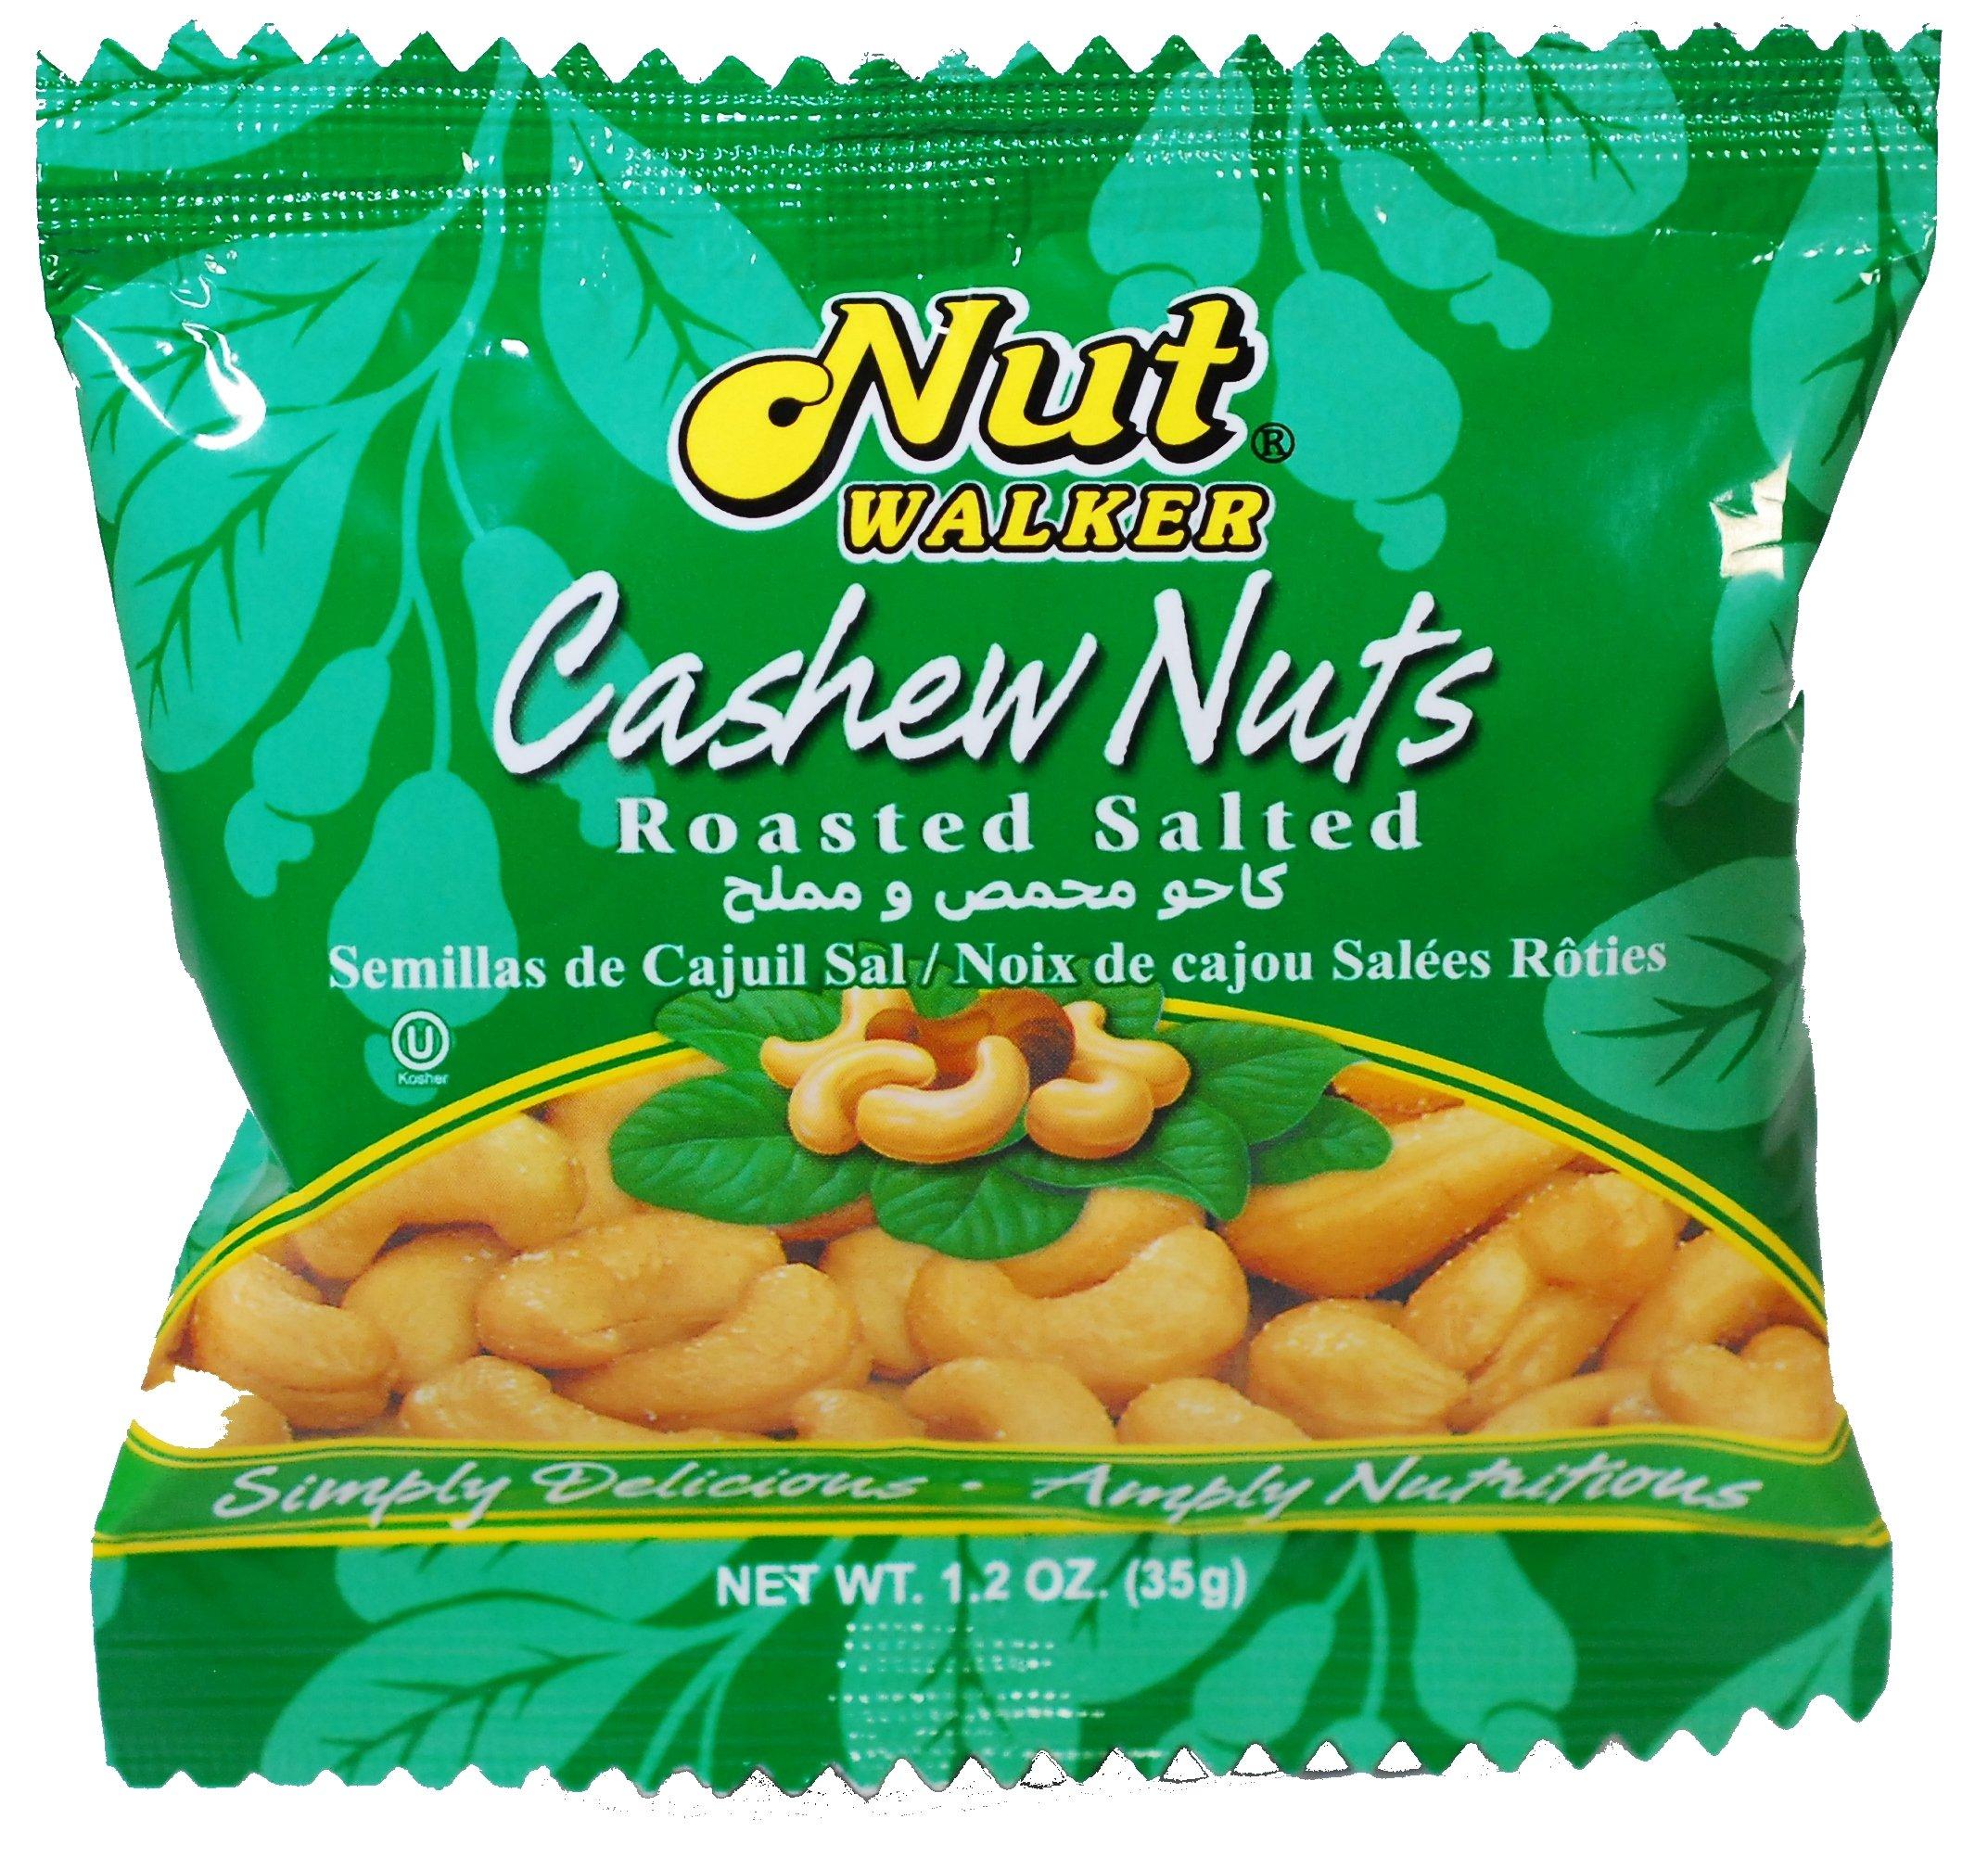 Roasted Salt cashew nuts 35gX6 bags